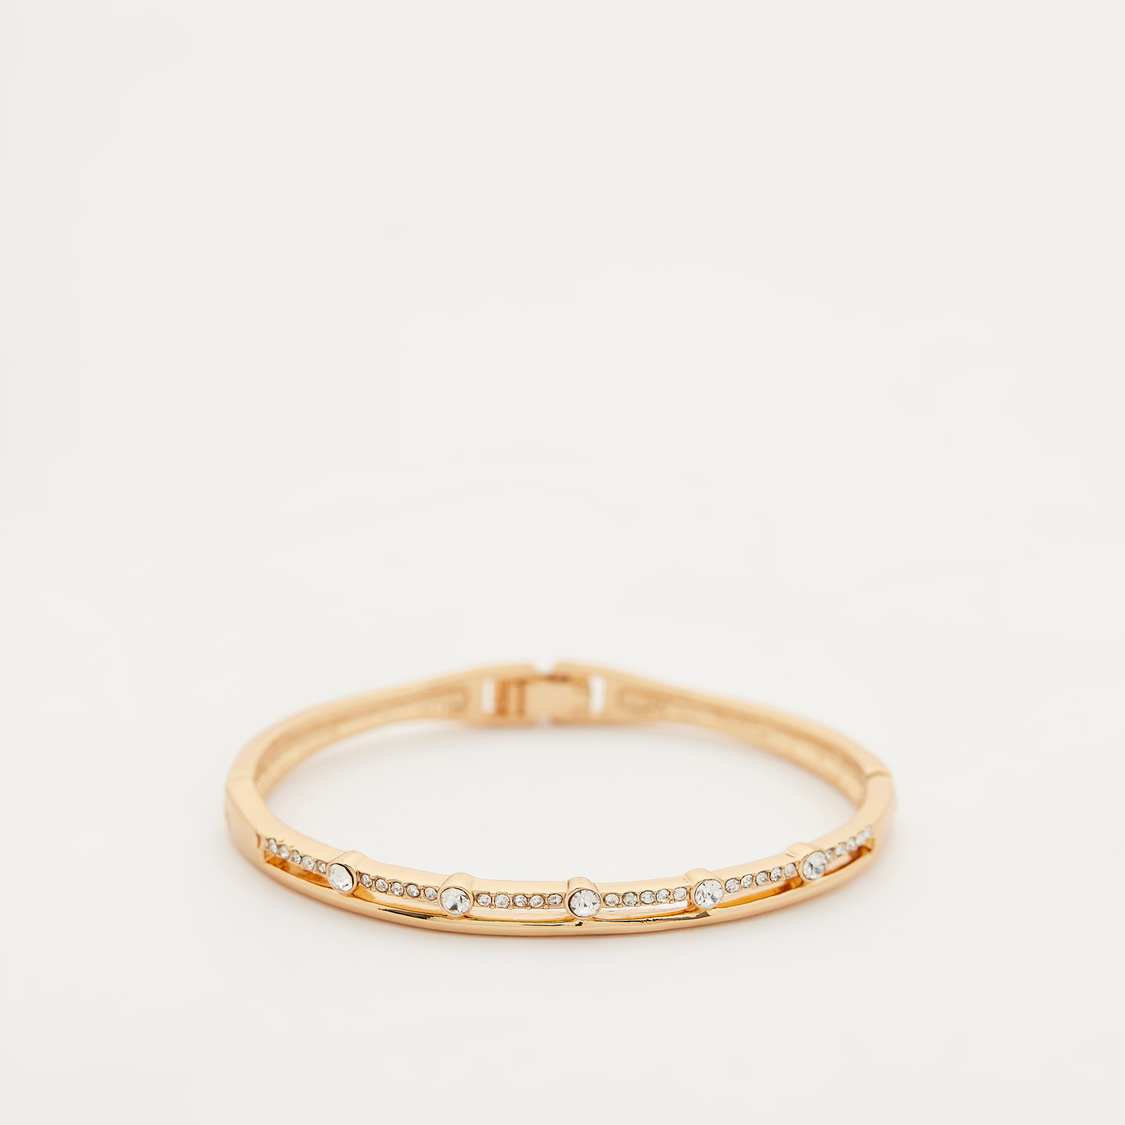 Stud Detail Bracelet with Foldover Clasp